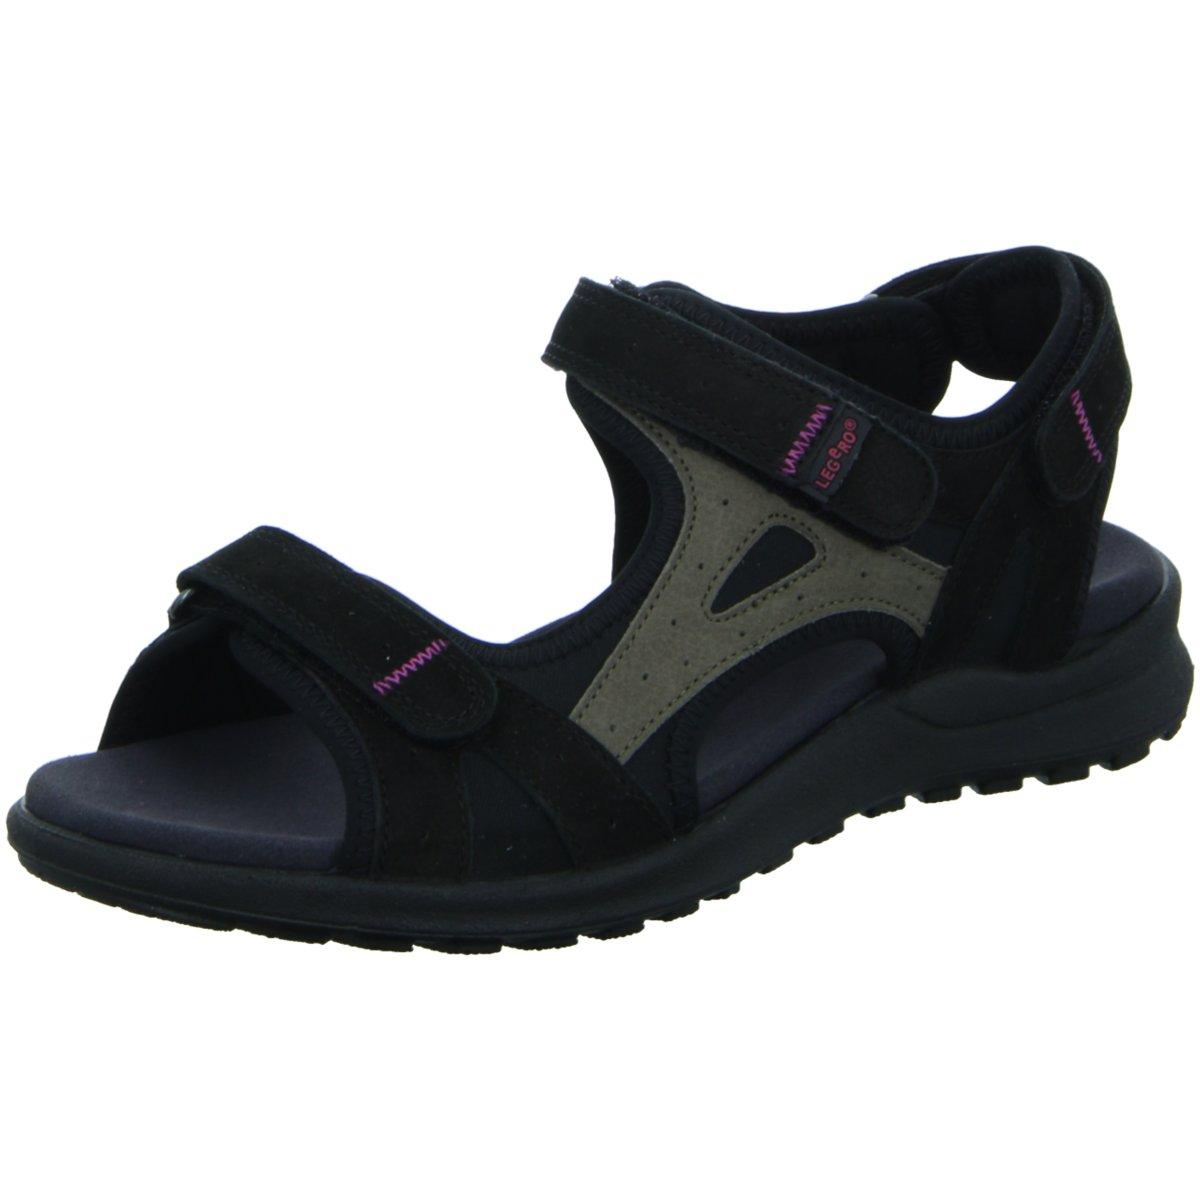 NEU Legero Damen Sandaleetten Sandaleette sportlicher Boden Boden Boden Siris 8-00732-00 58662c